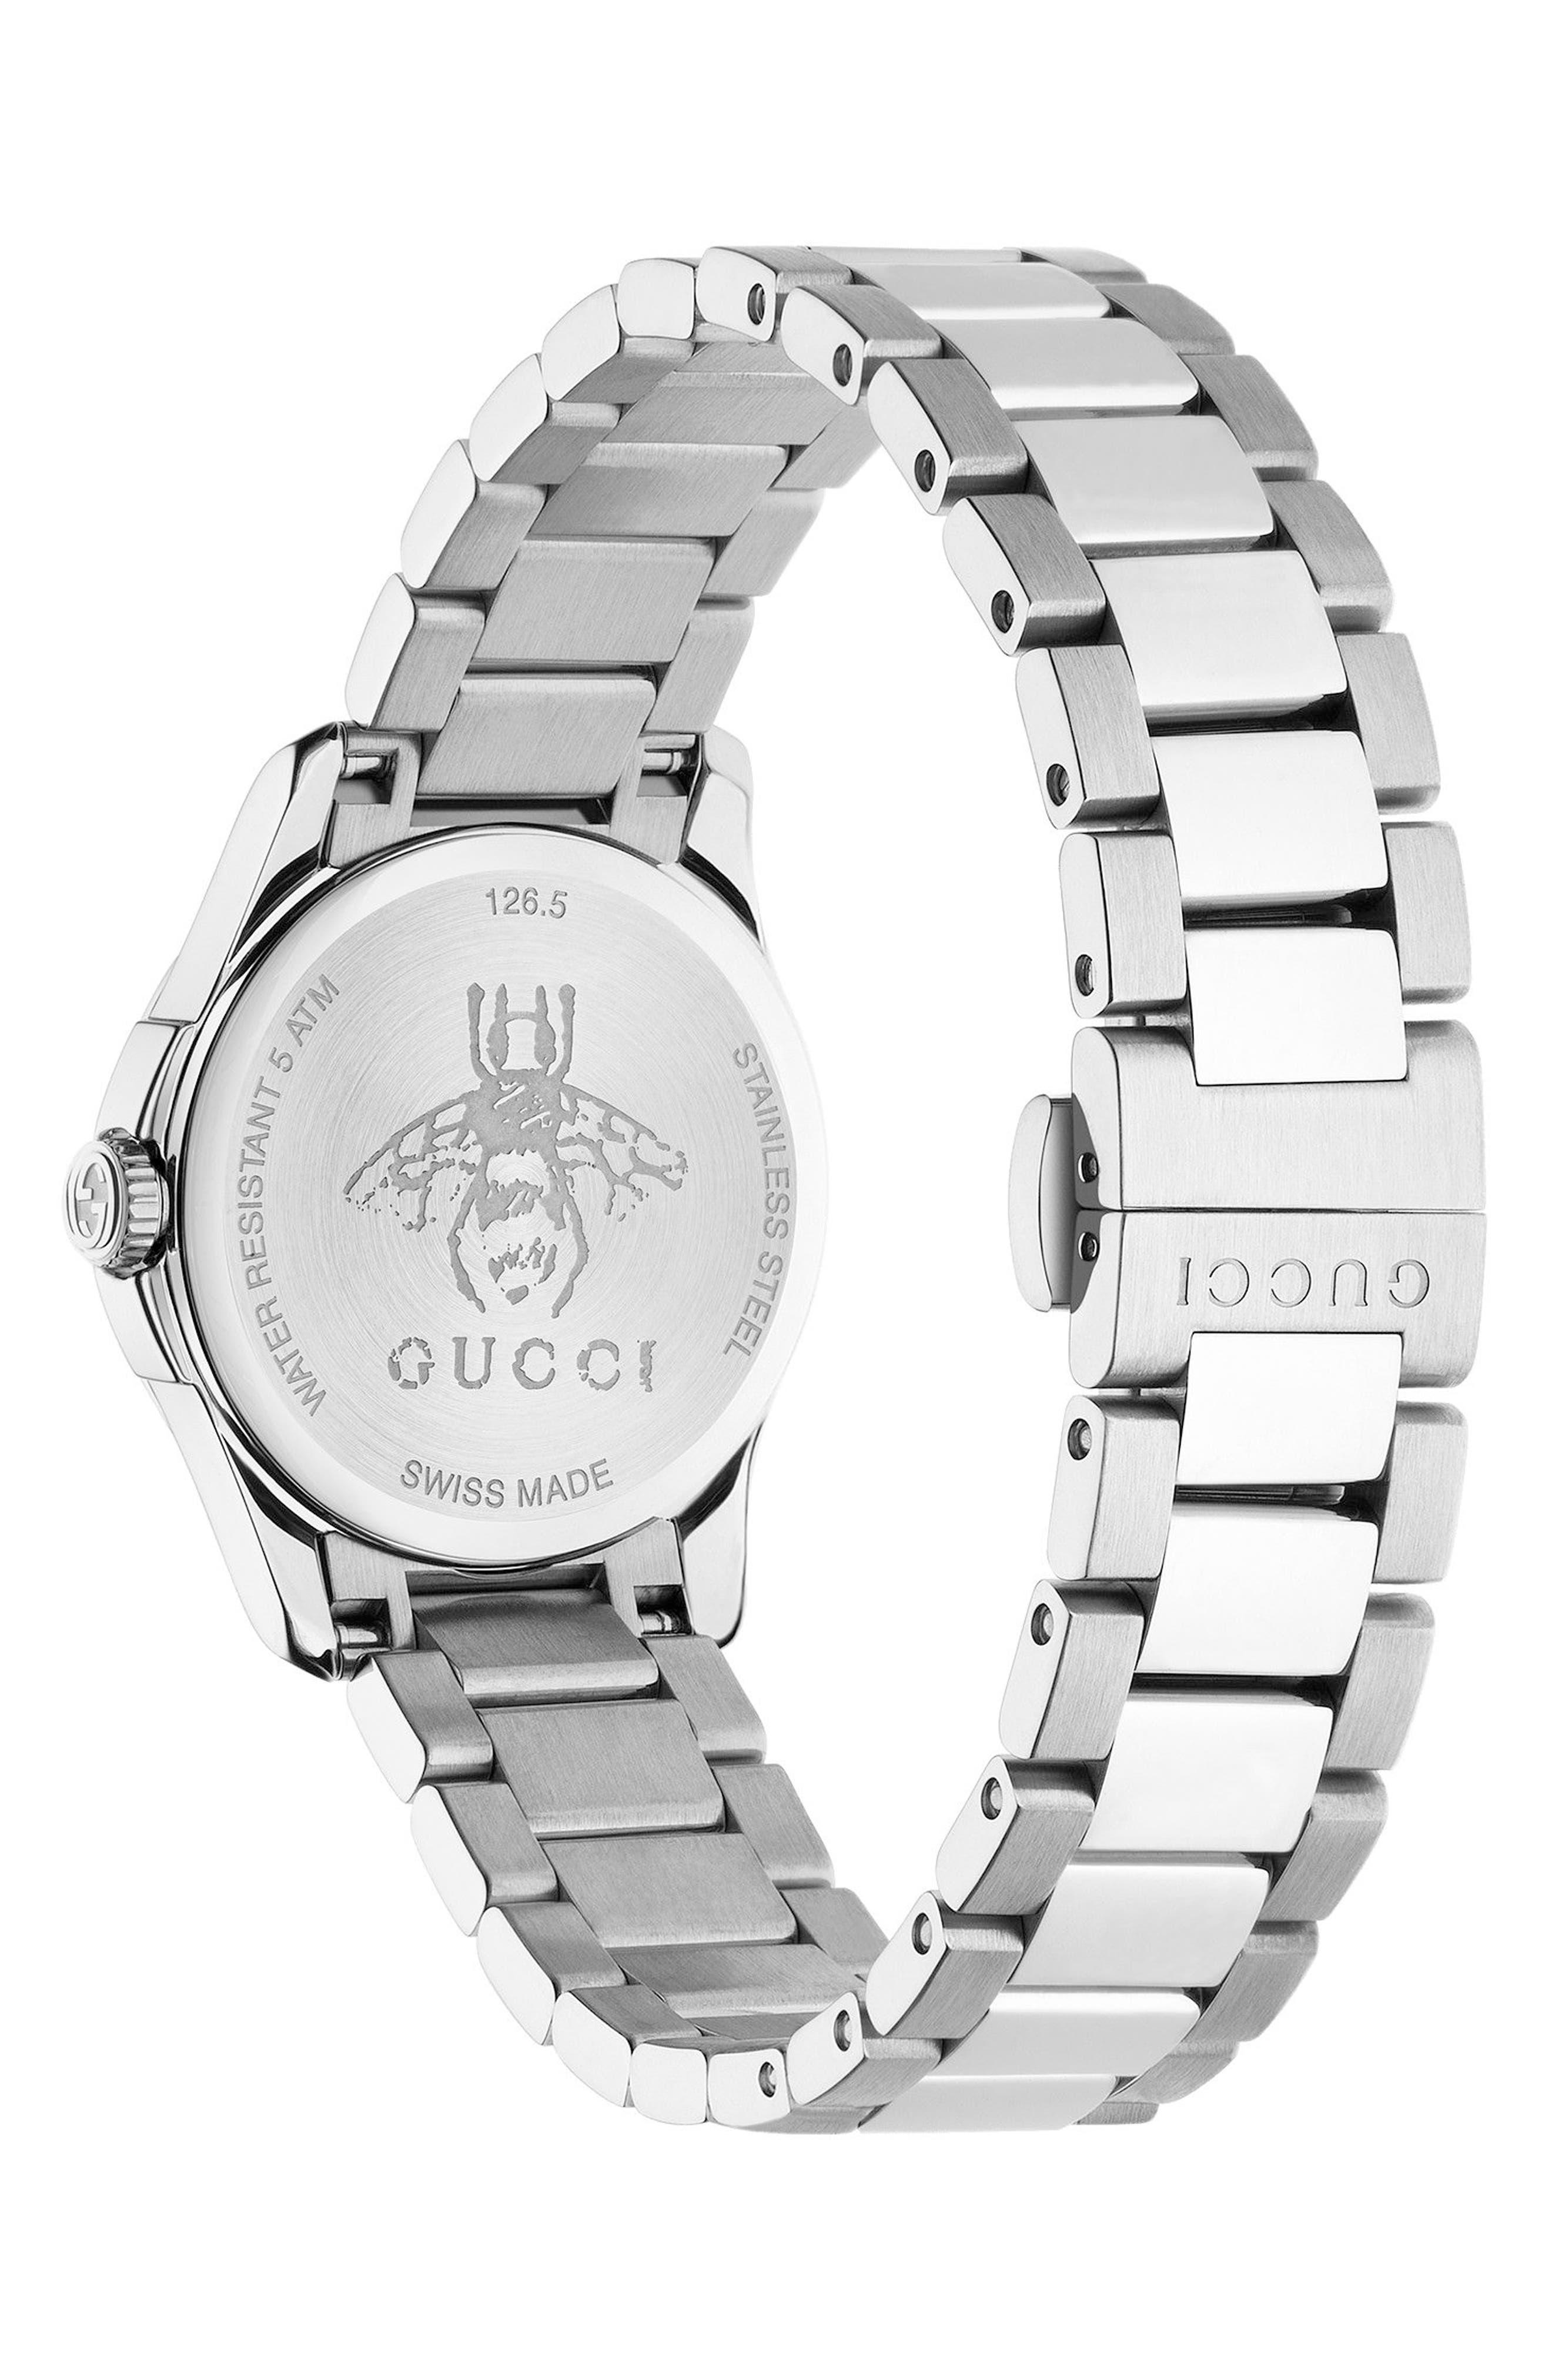 GUCCI, G-Timeless Bracelet Watch, 27mm, Alternate thumbnail 2, color, SILVER